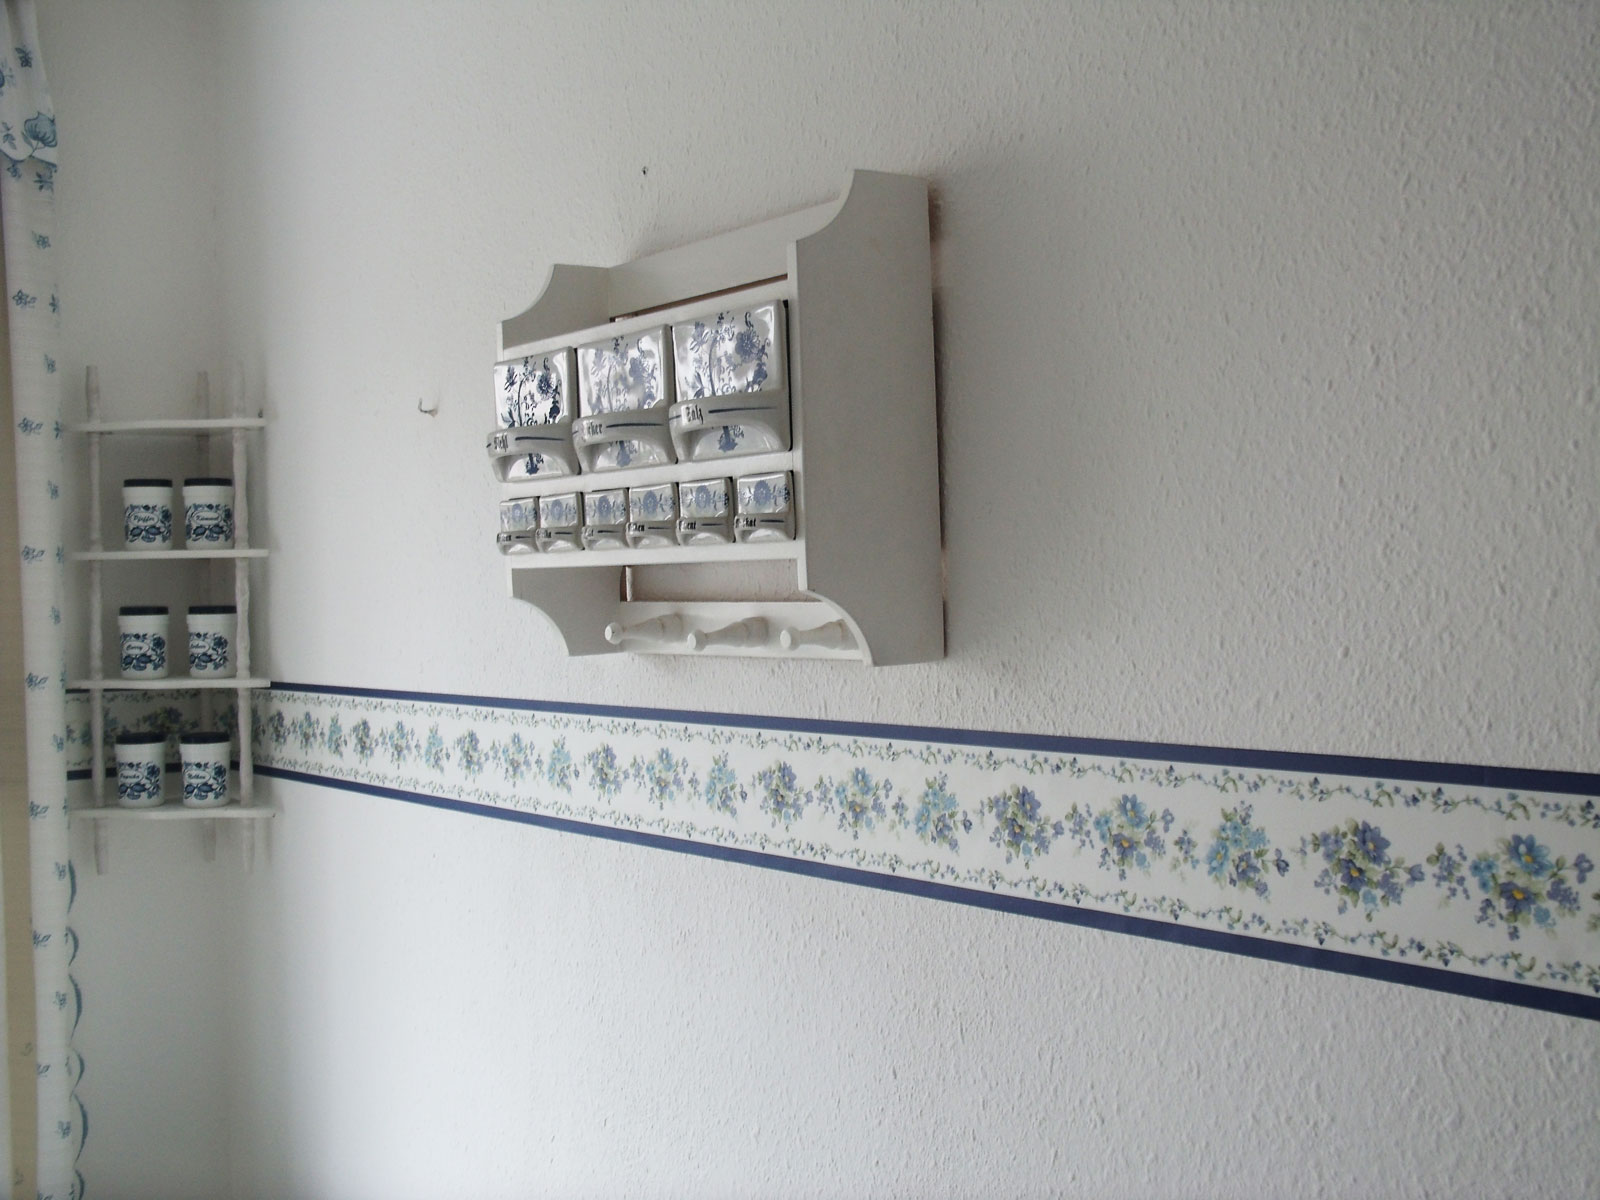 bord re tapeten borte violette blumen bl ten selbstklebend 4 00 1m k che wand ebay. Black Bedroom Furniture Sets. Home Design Ideas